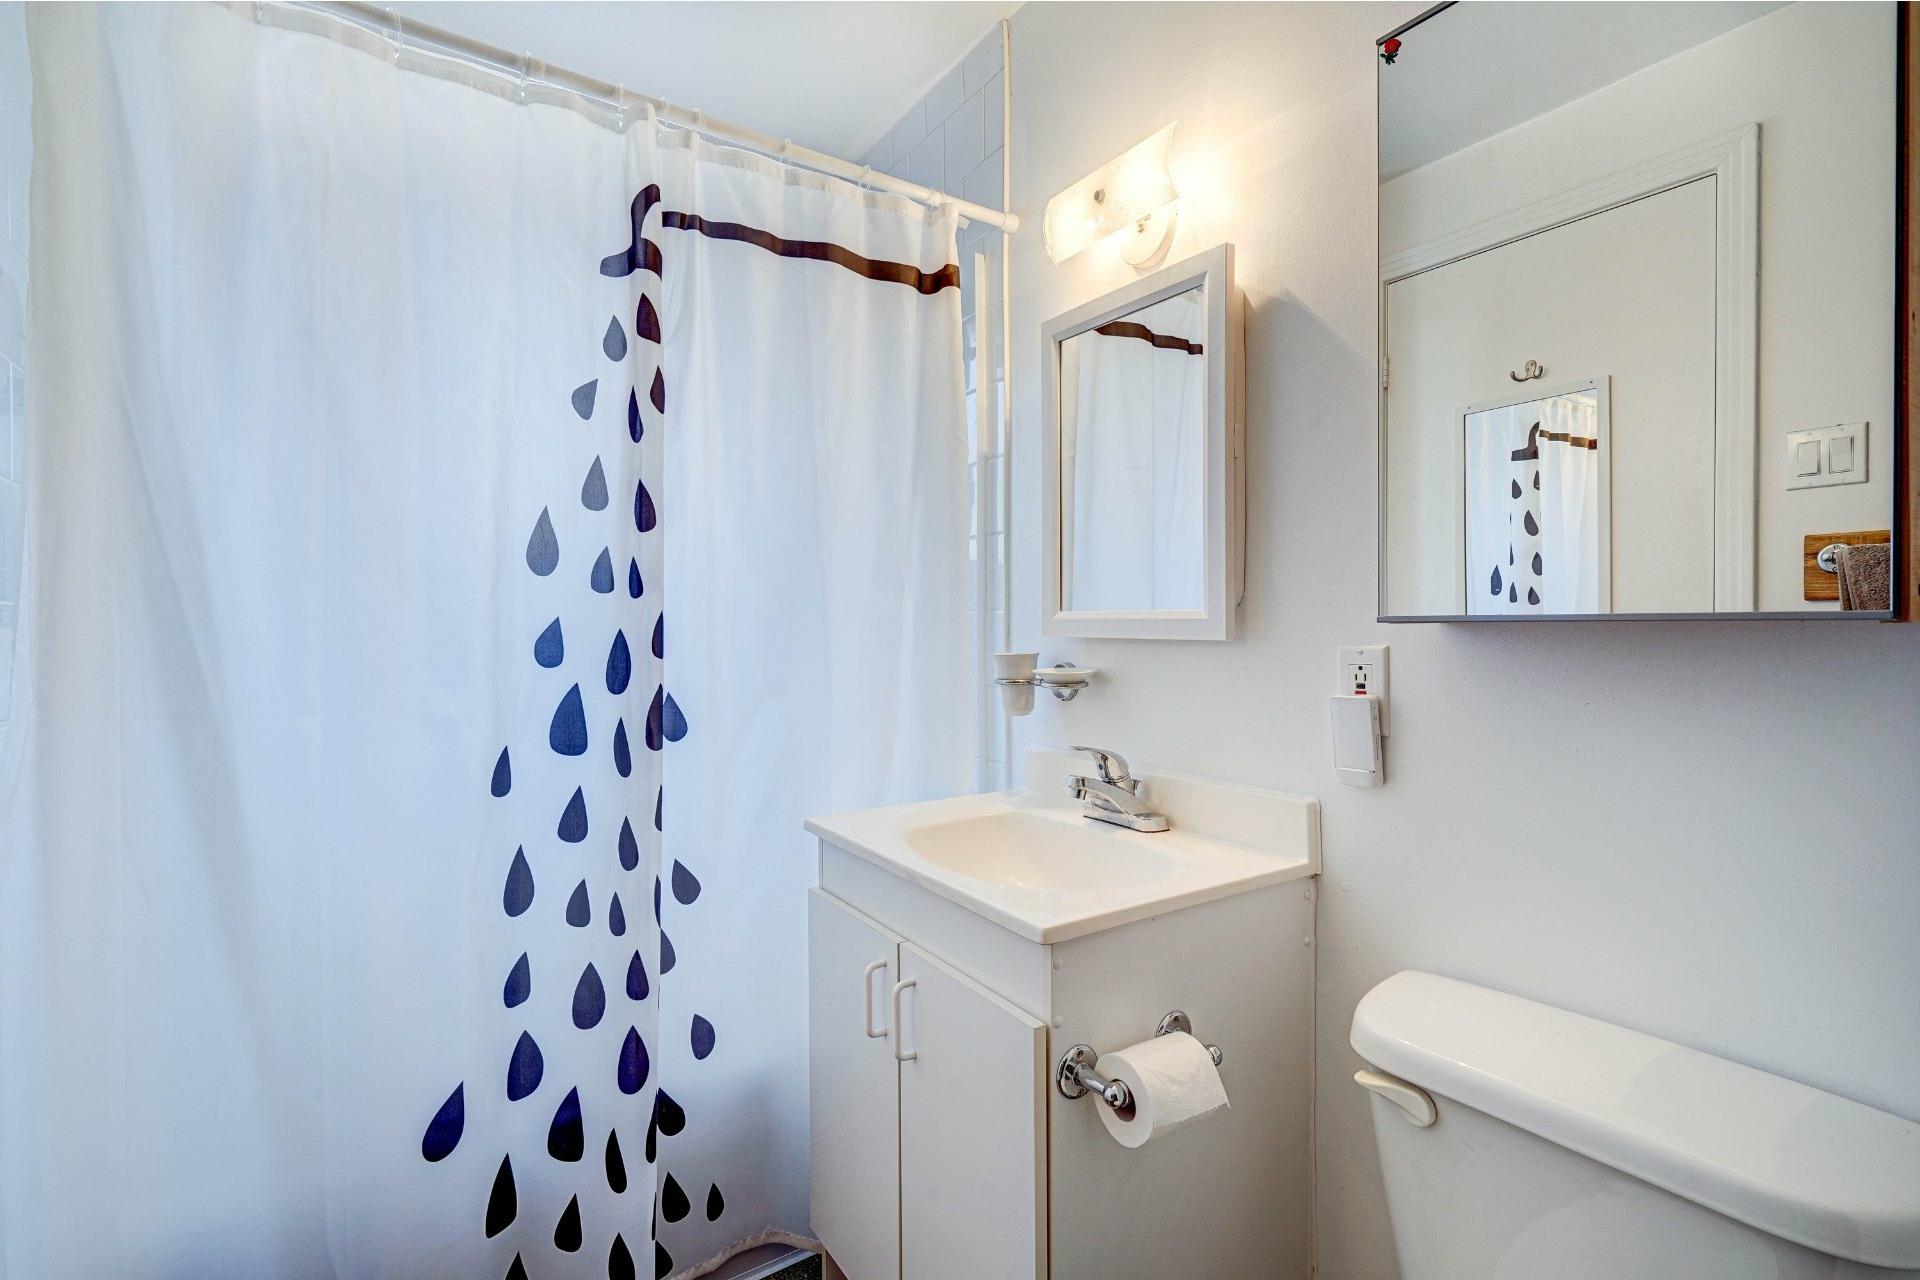 image 24 - Triplex For sale Dorval - 4 rooms